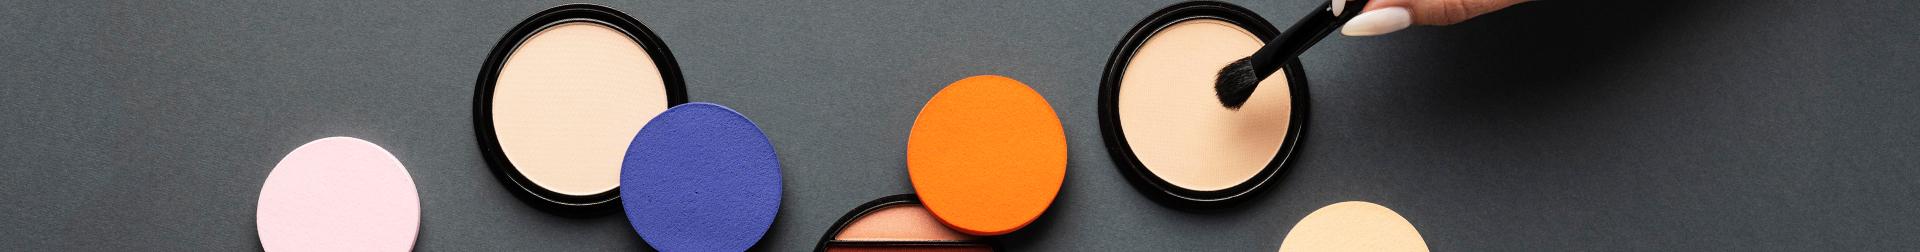 Makeup Products | Buy Loose Powder Online | AromaCraze